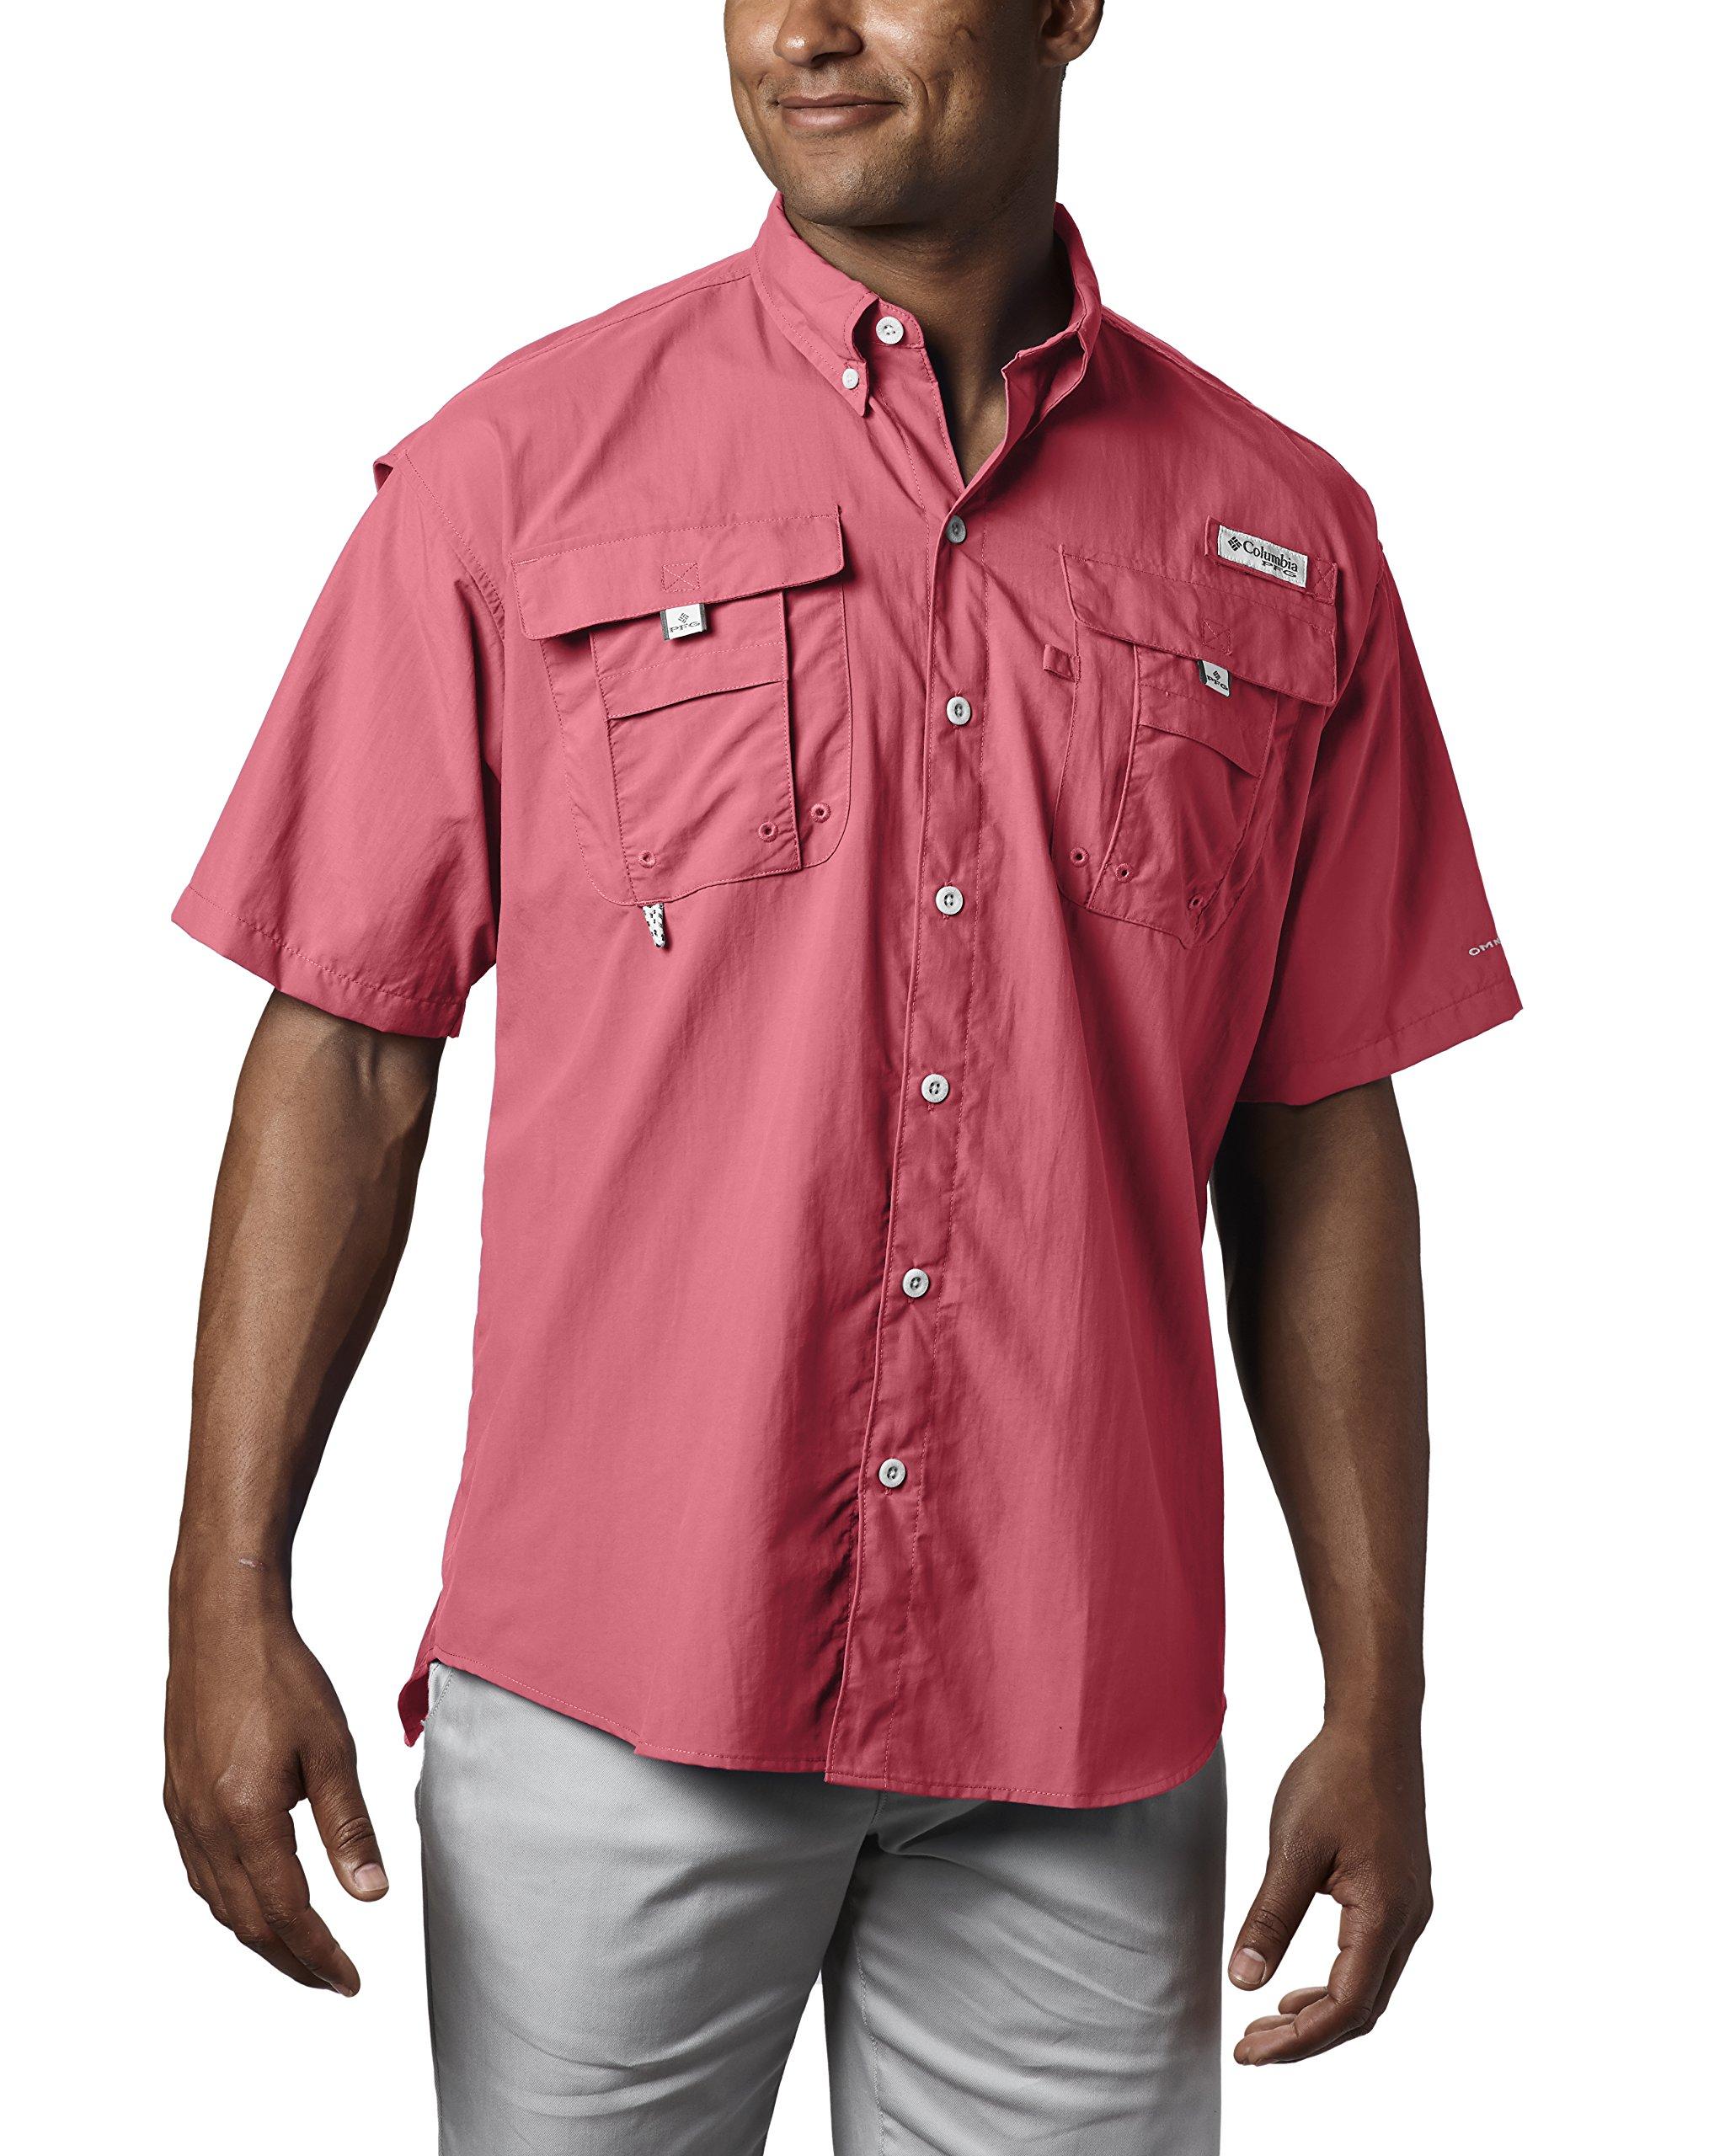 Columbia Men's Bahama II Short Sleeve Shirt, Sunset Red, 3X